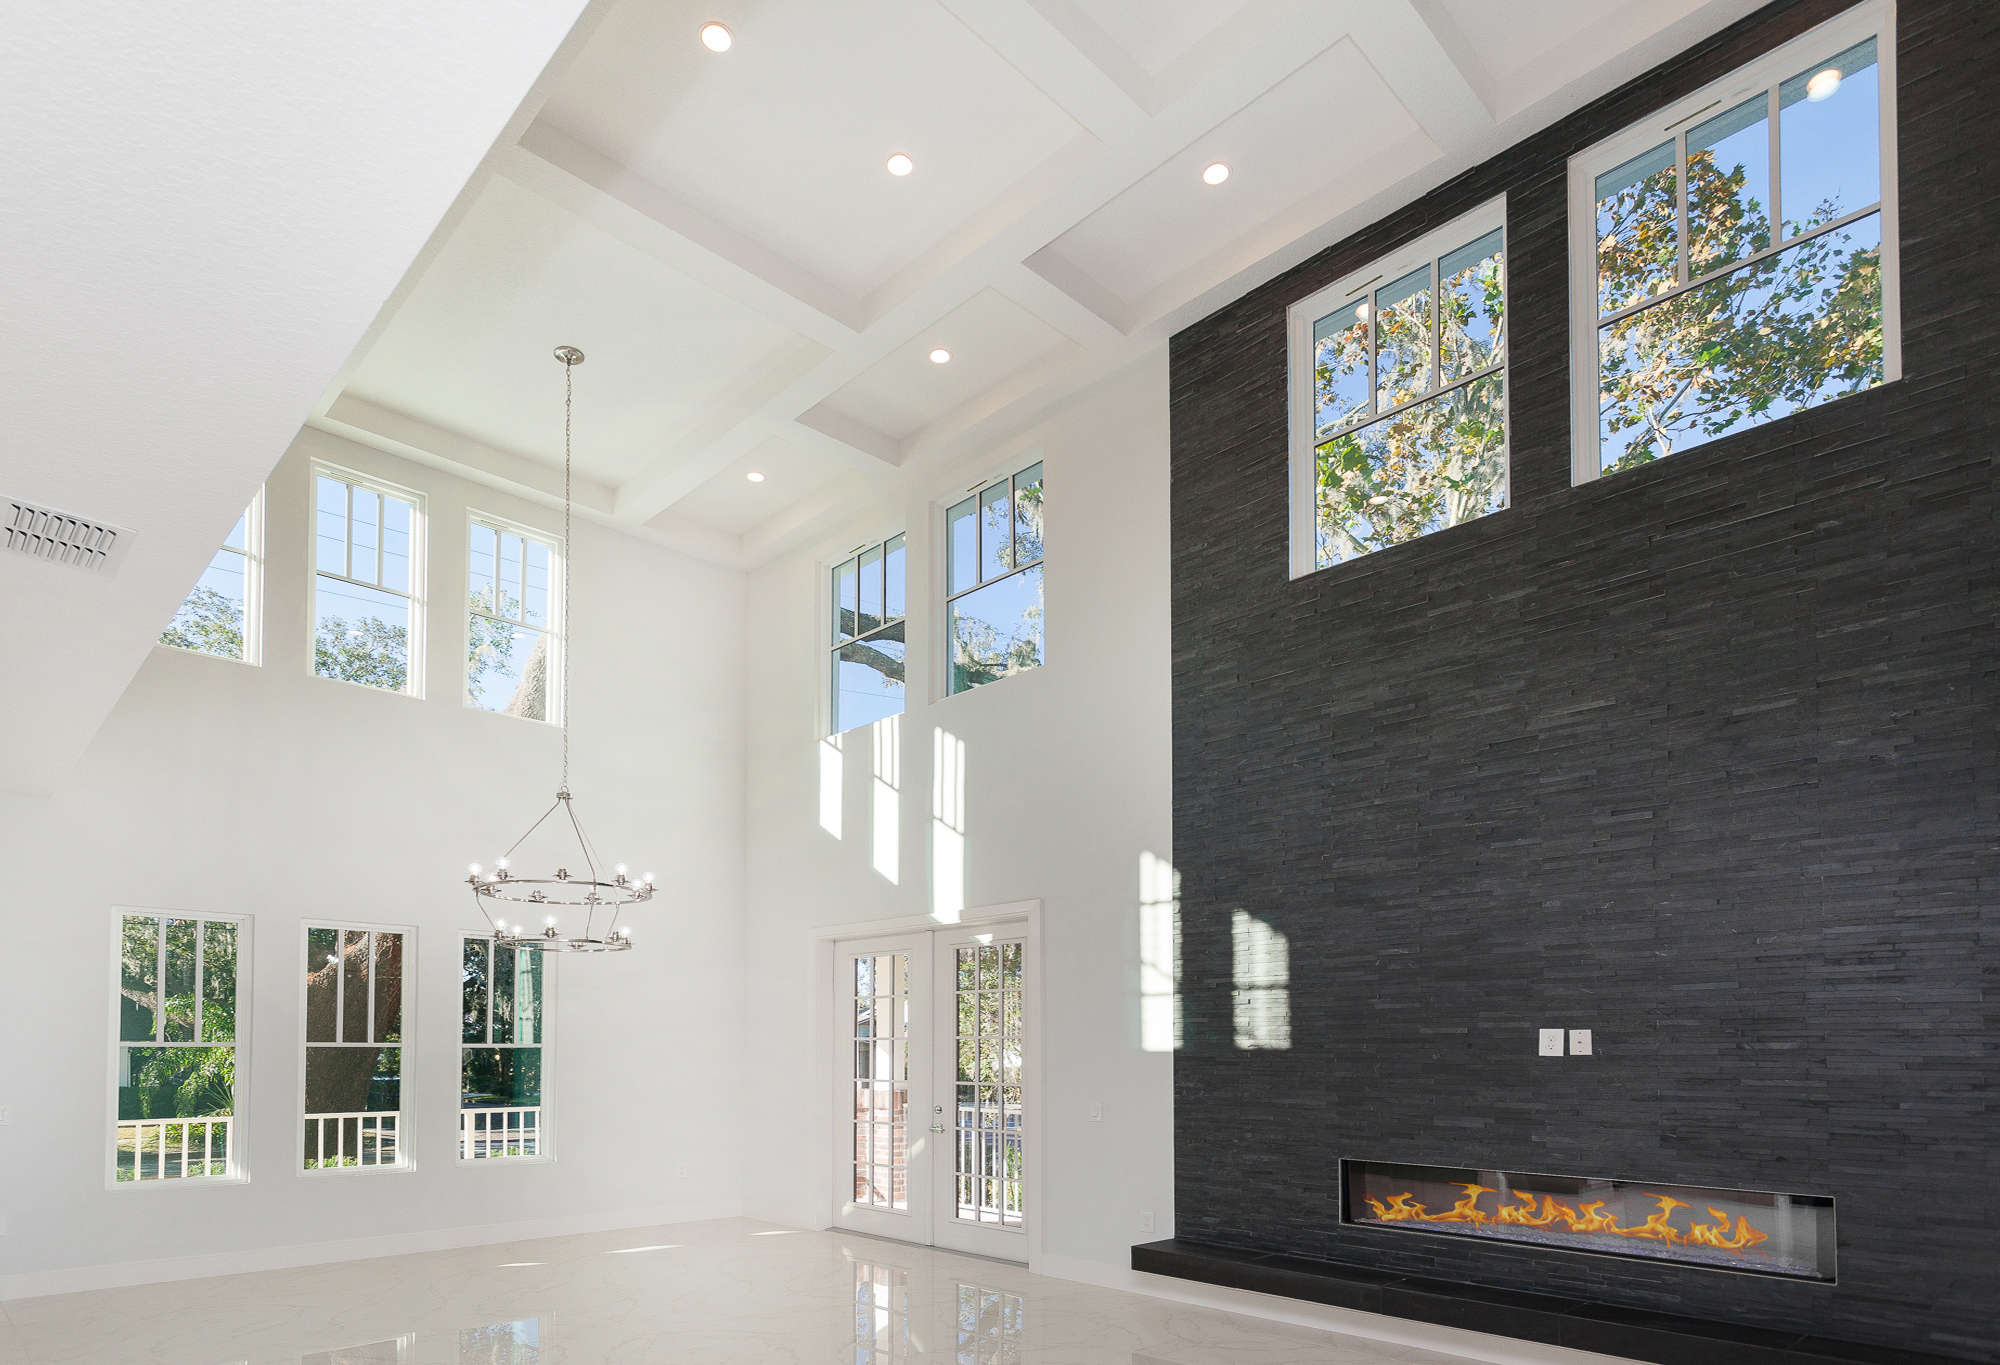 impressive design - timeless floor plans with unique design elements